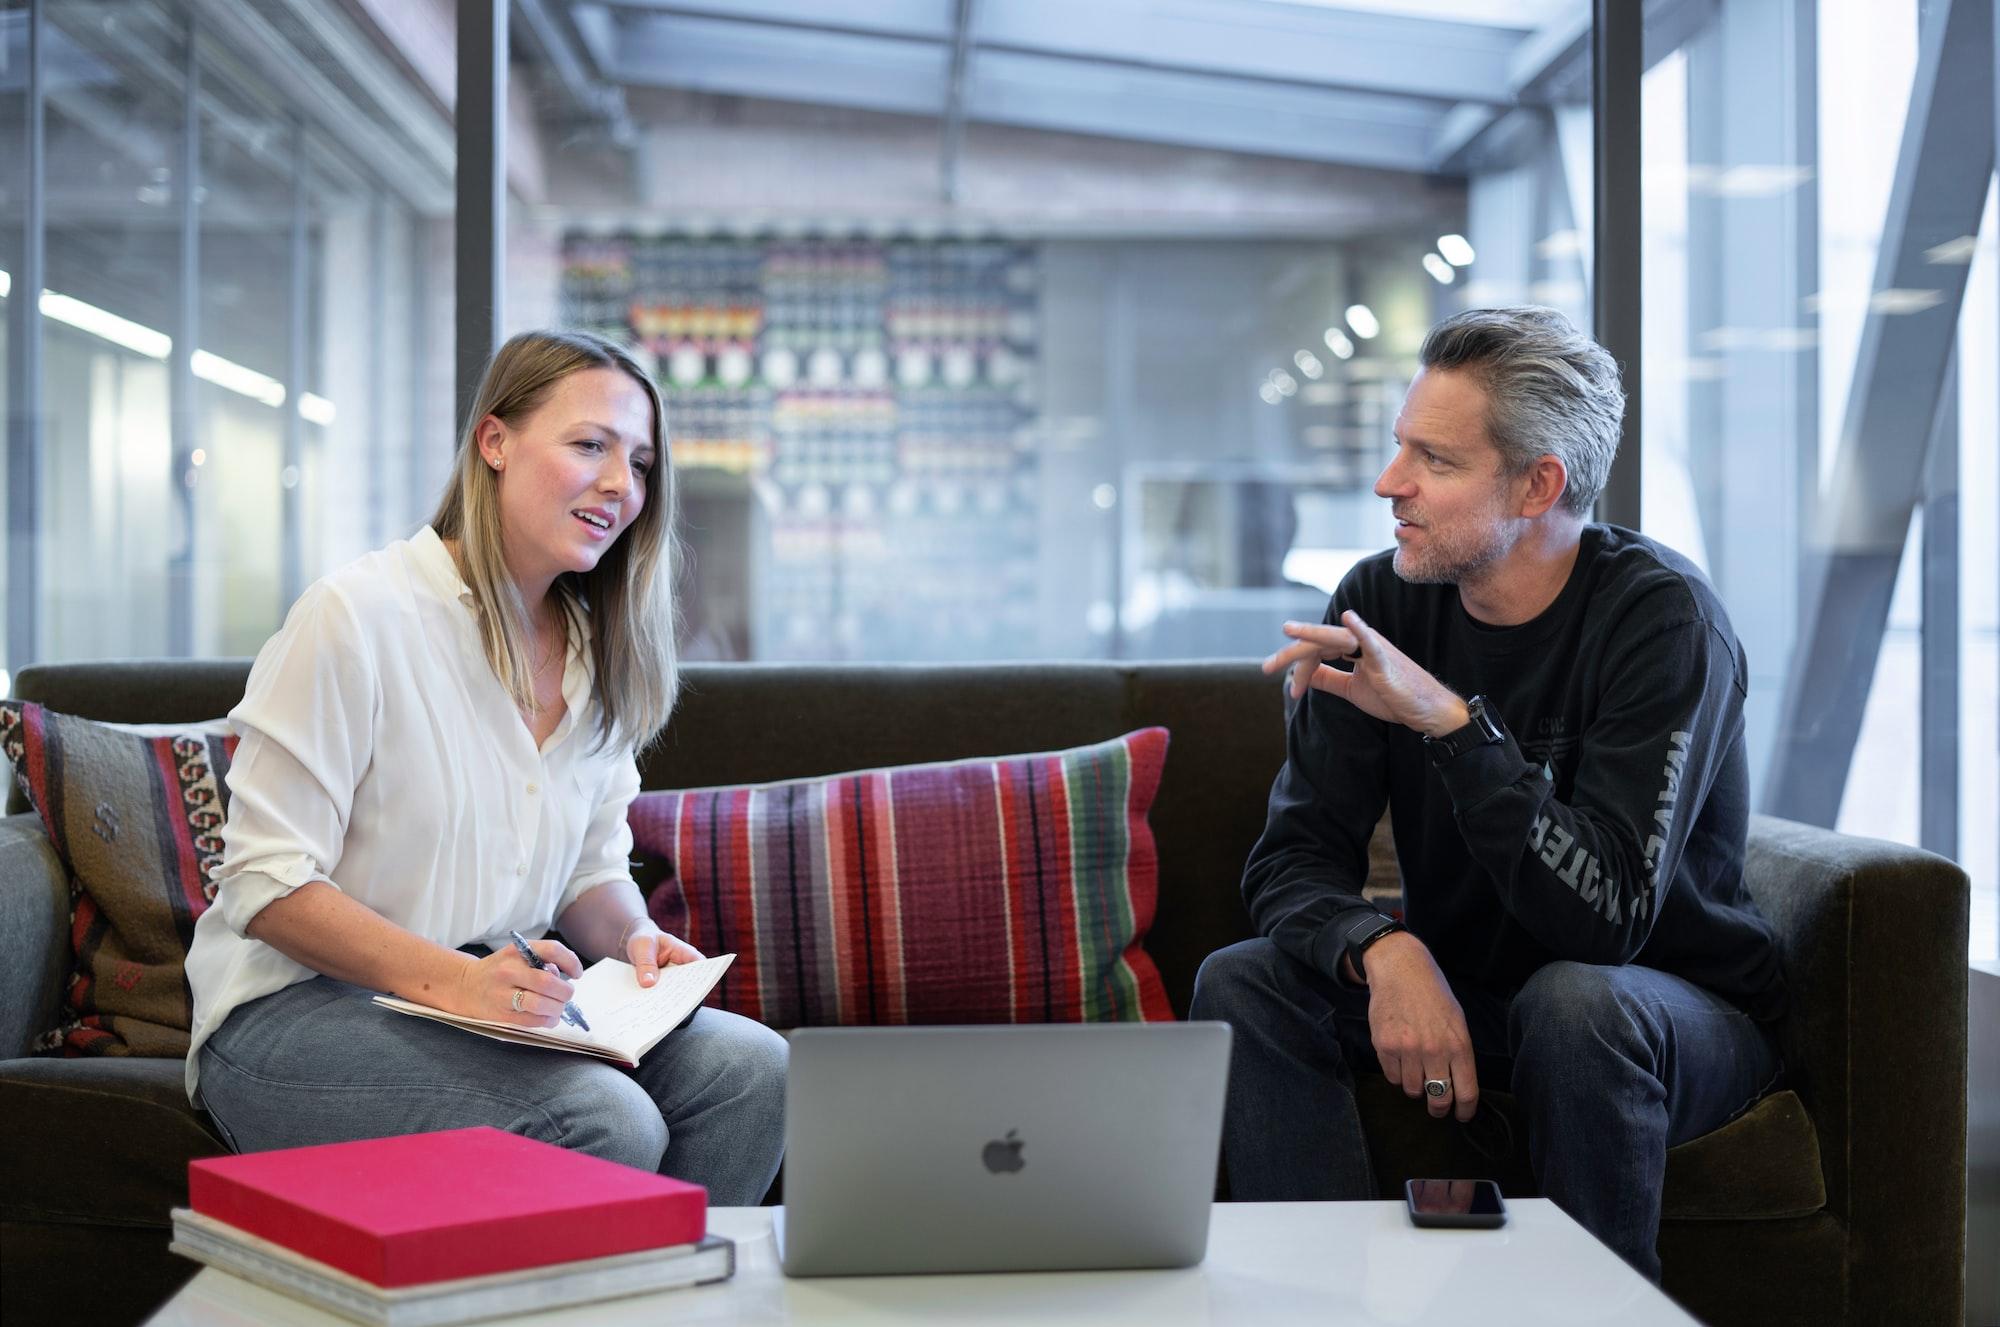 Relation manager collaborateur : pourquoi et comment manager son manager ?